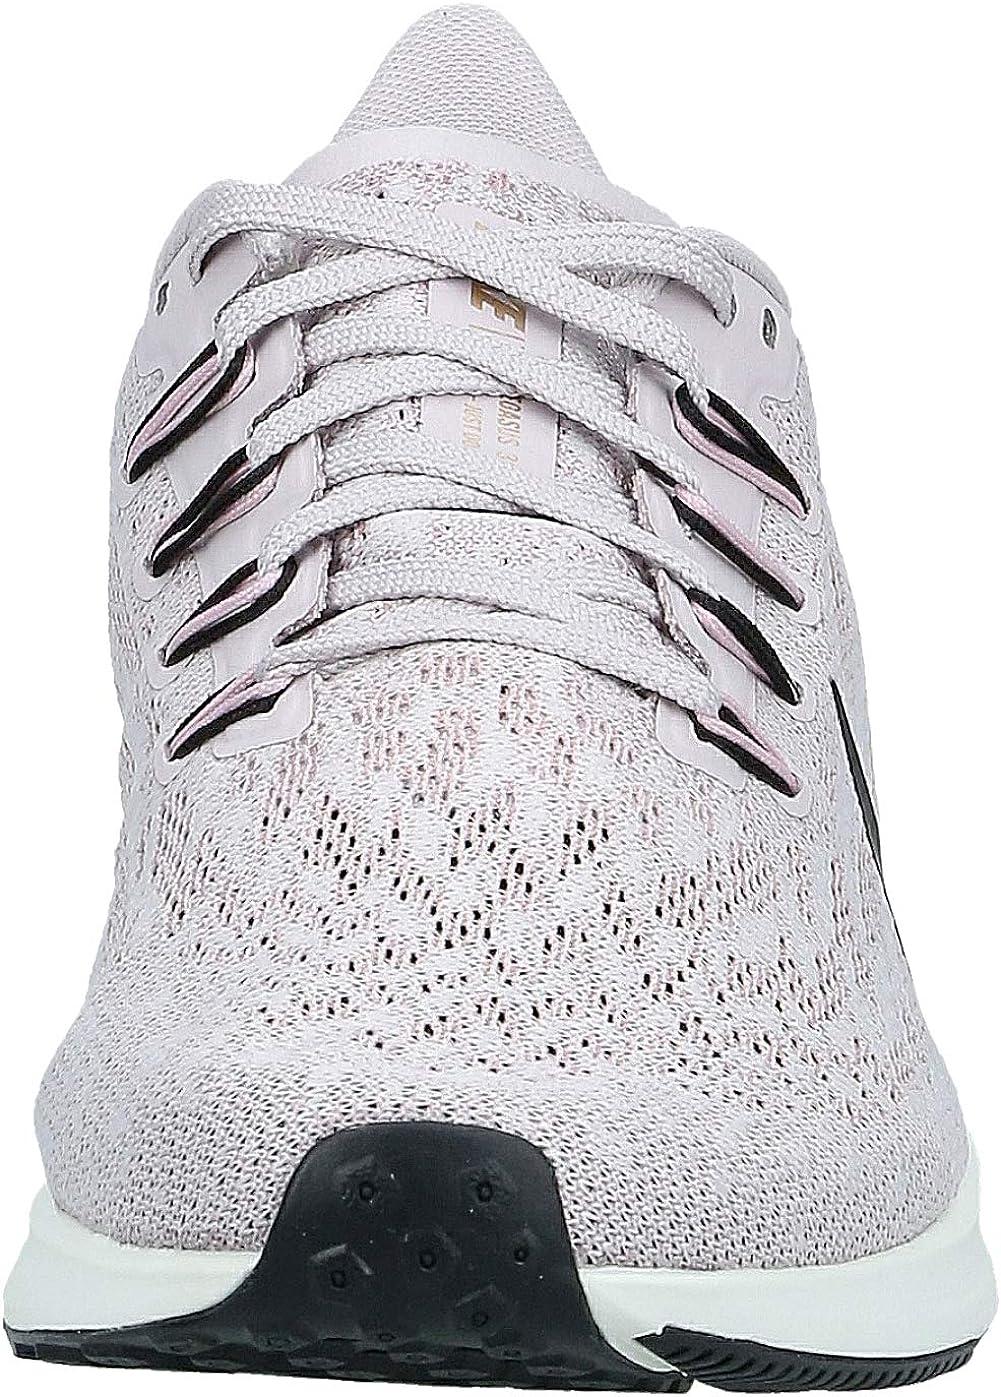 Nike Women's Air Zoom Pegasus 36 Running Shoes Platinum Violet Black Plum Chalk Sail